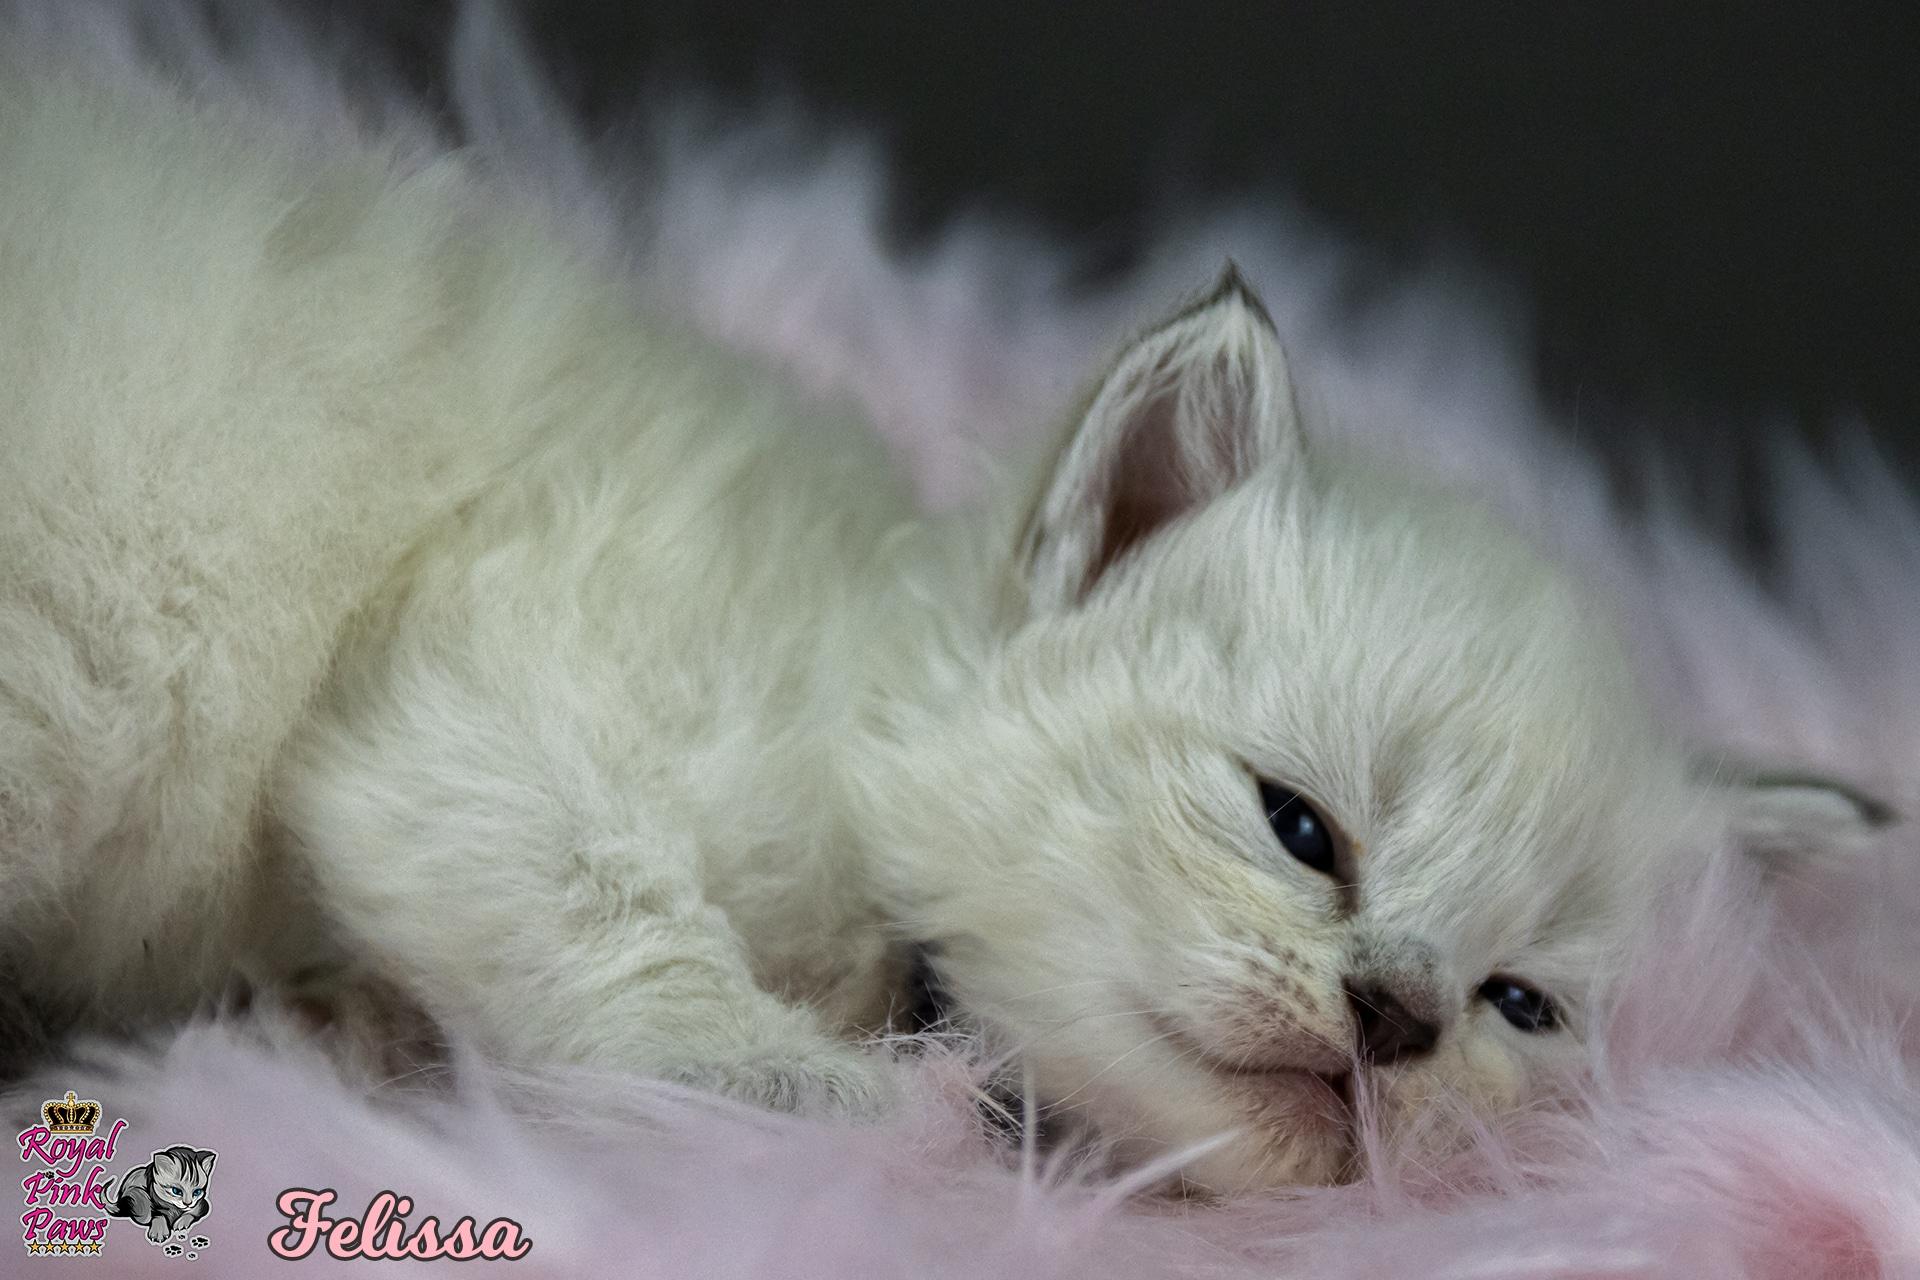 Neva Masquarade - Felissa Royal Pink Paws